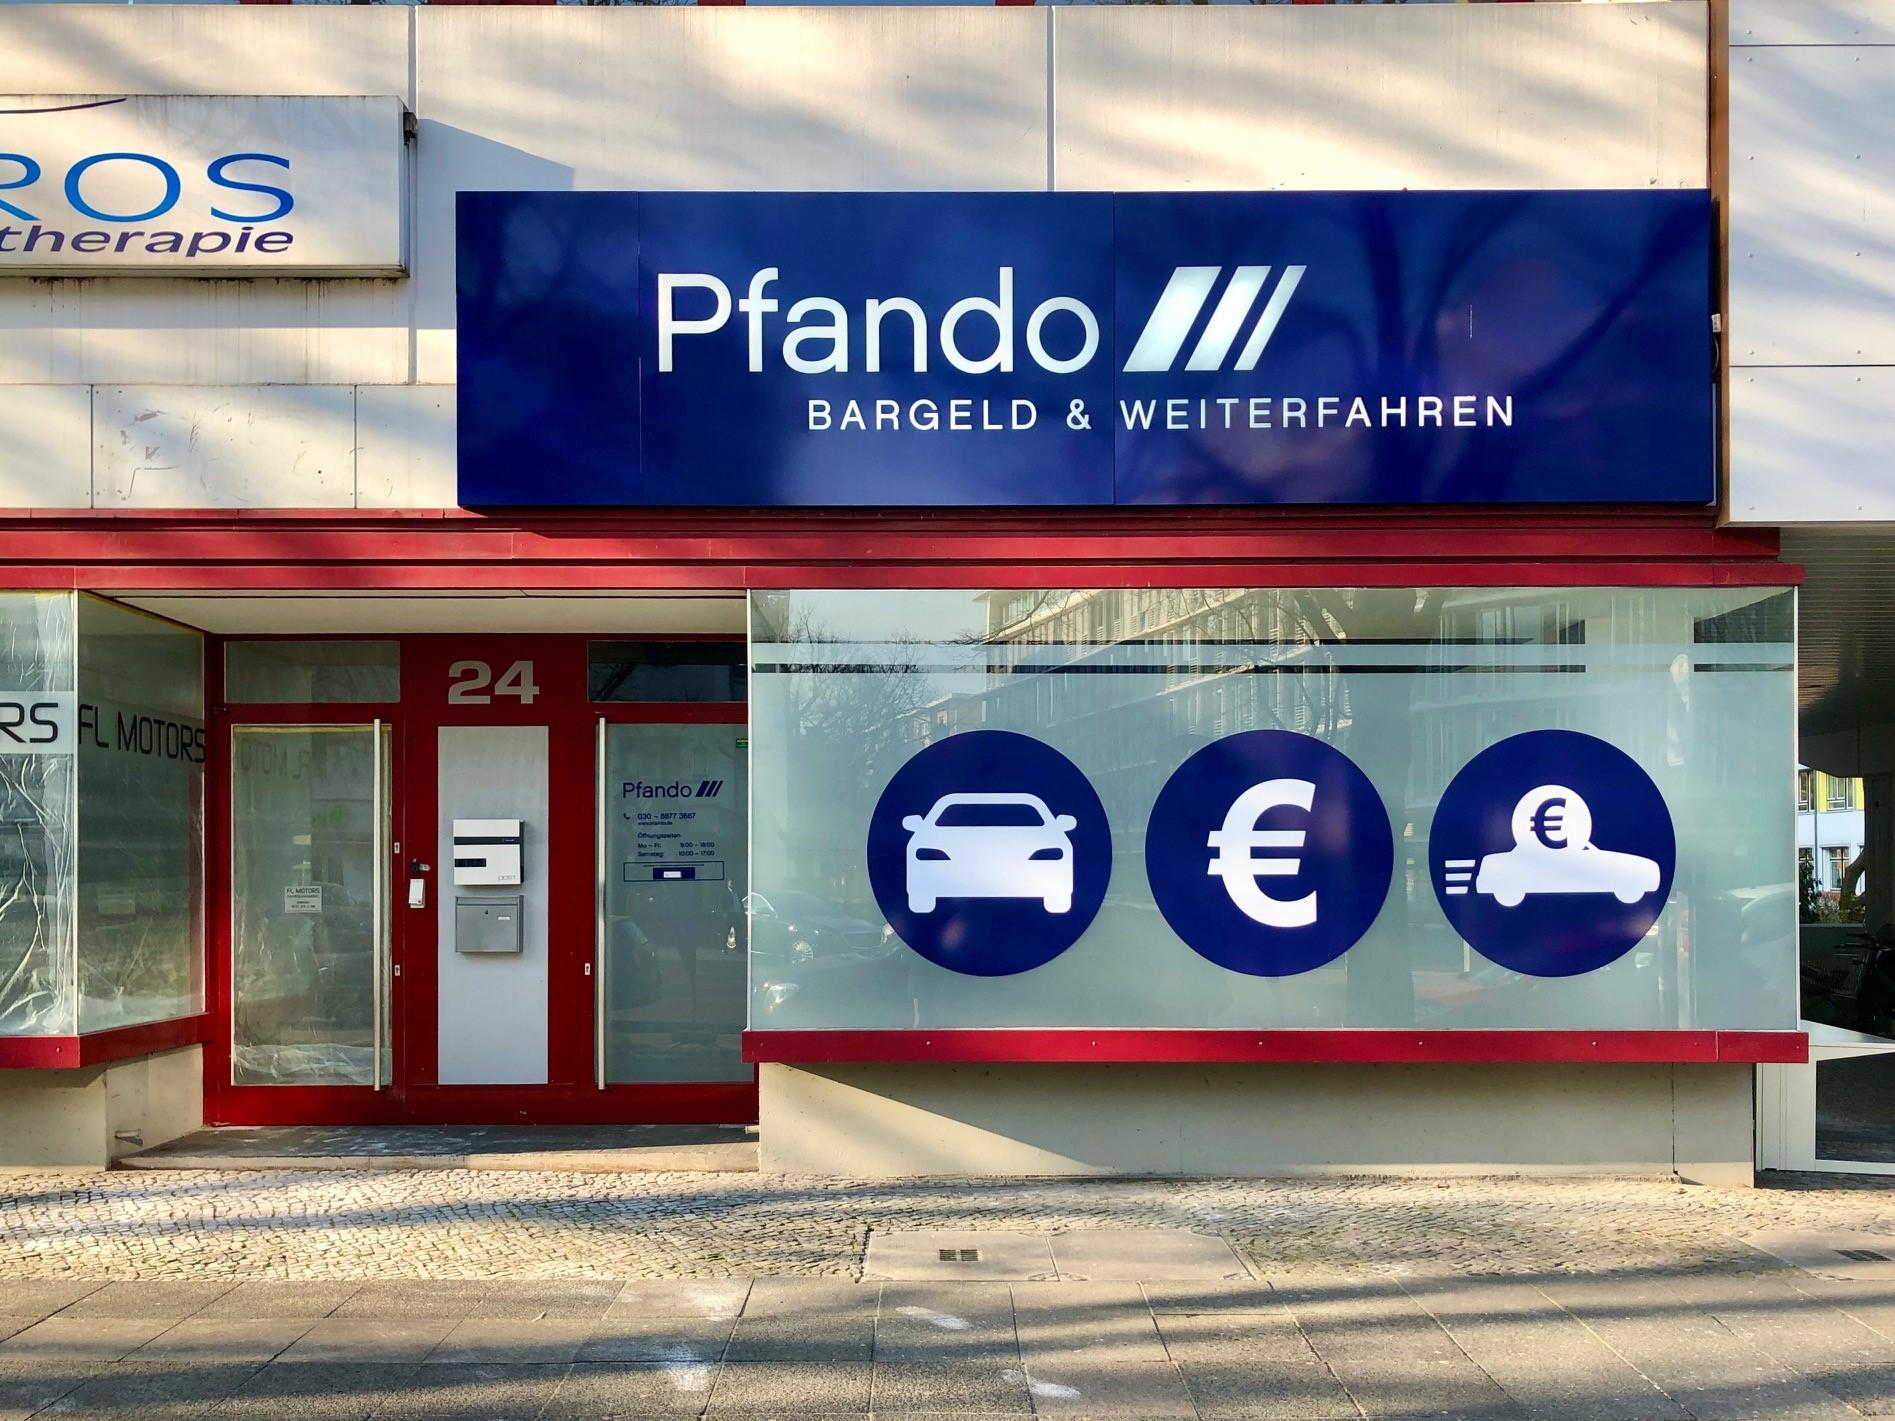 Pfando - Kfz-Pfandleihhaus Berlin